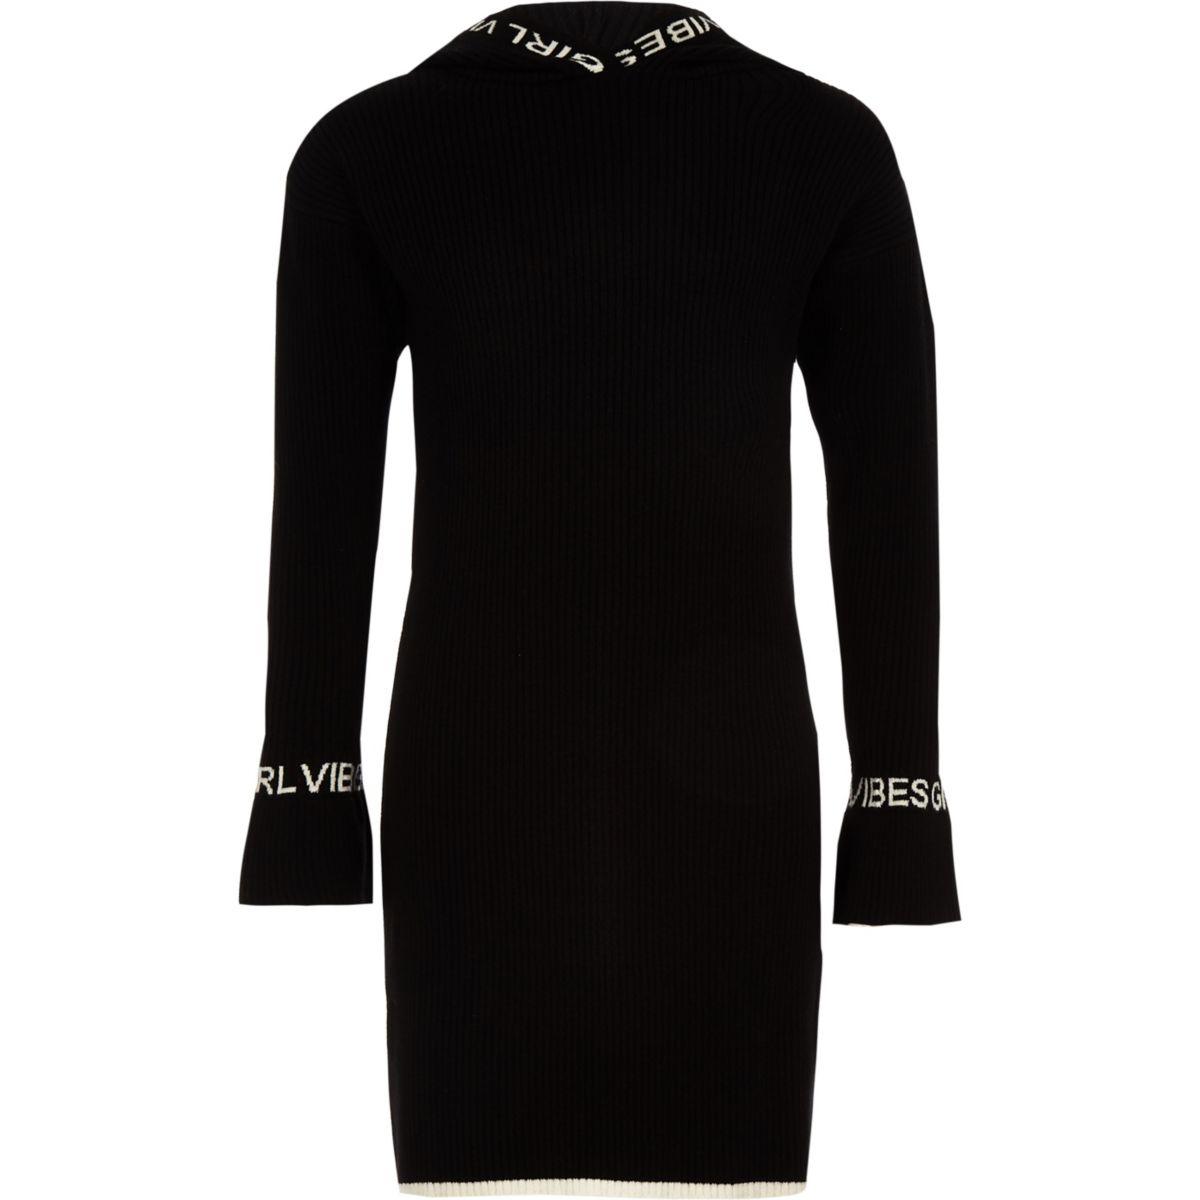 Girls black 'Girls vibe' hooded knit dress